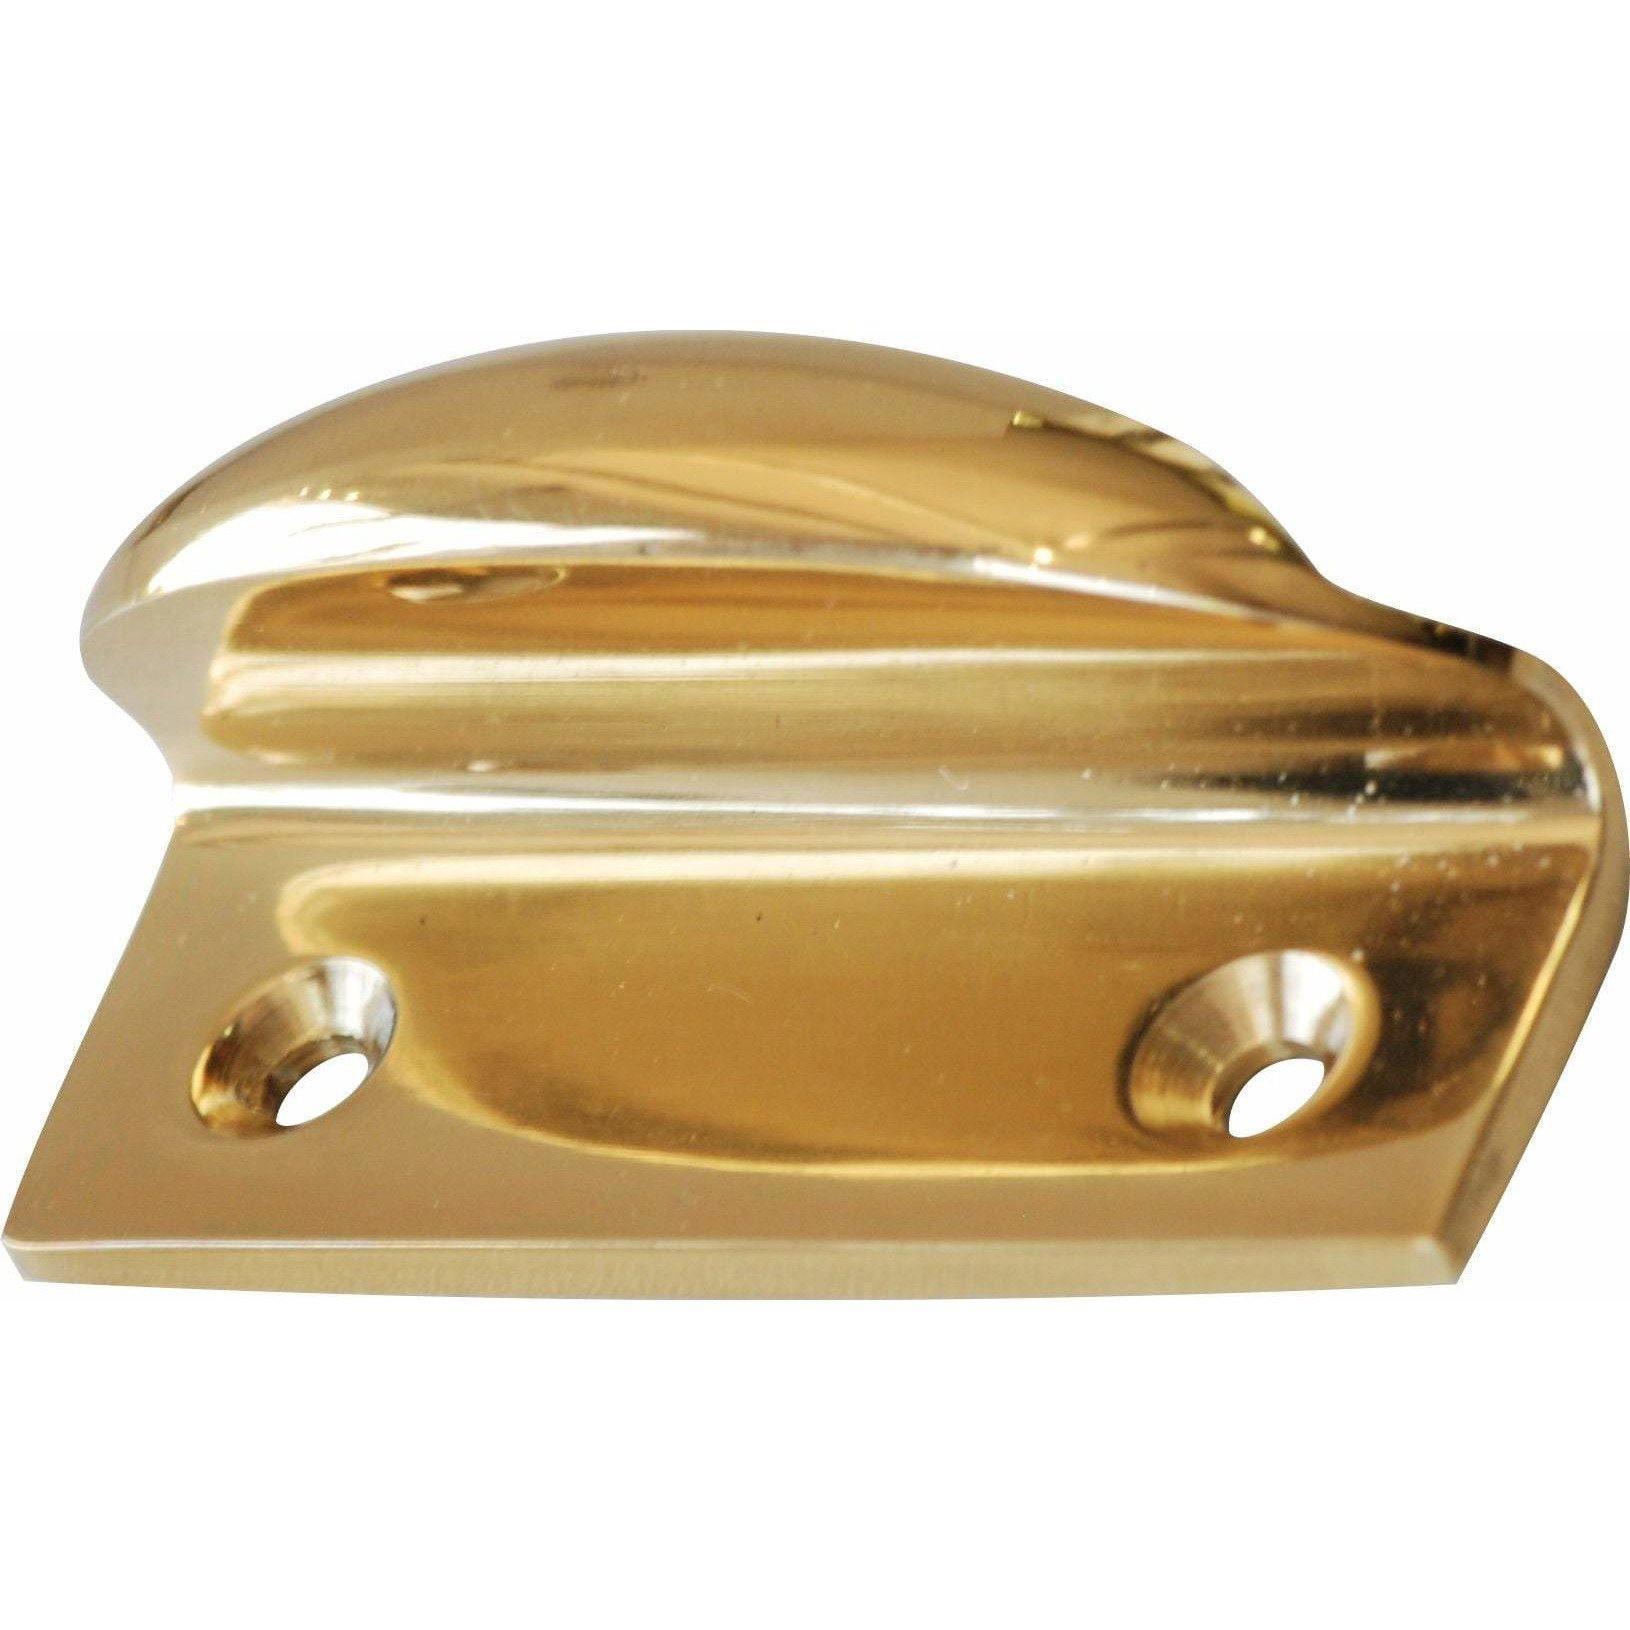 Solid Brass sash lift